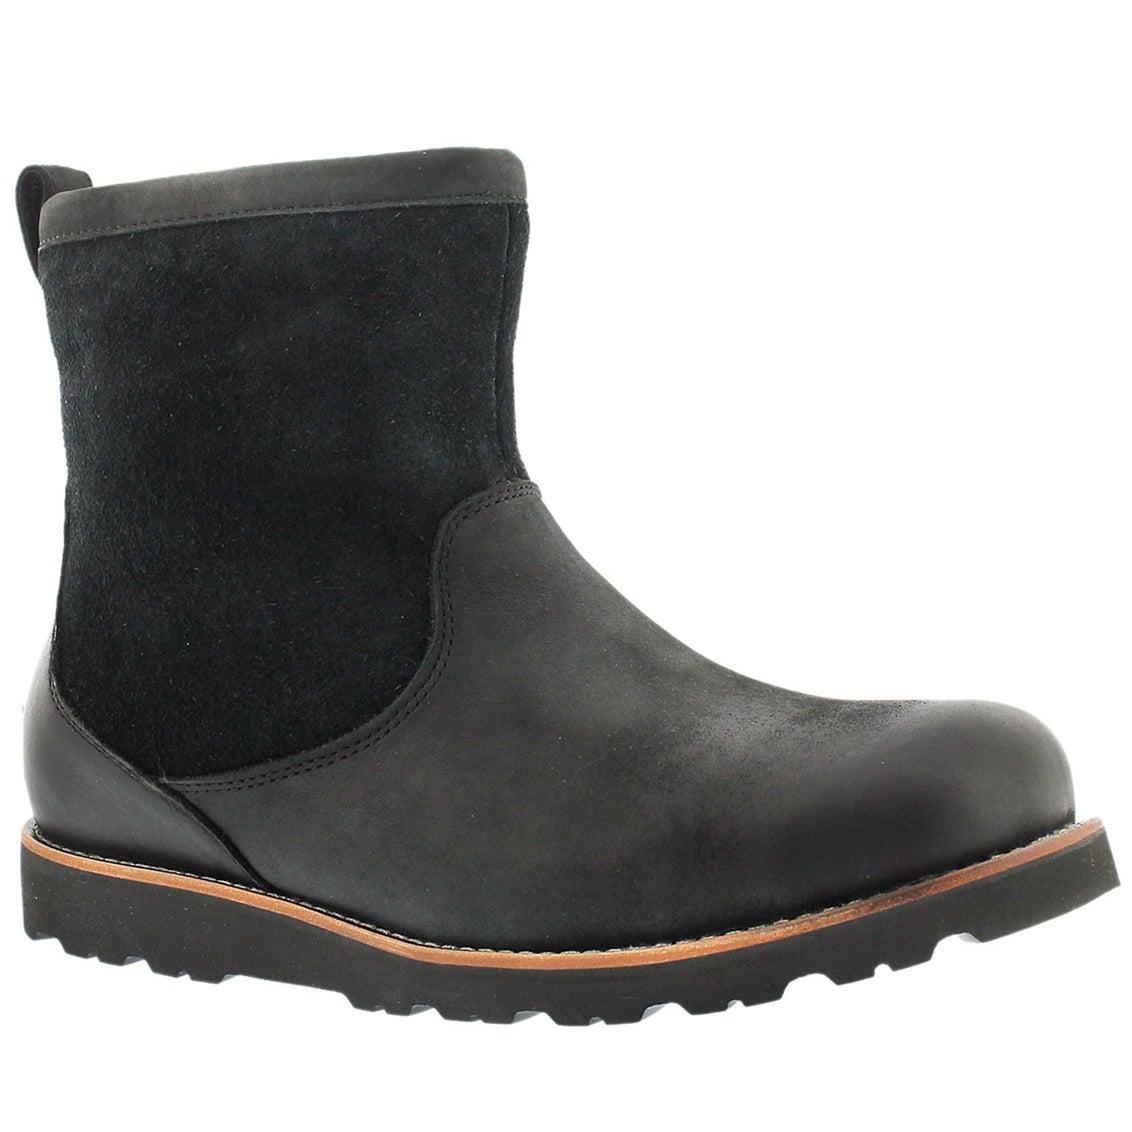 Mns Hendren TL blk wtpf ankle boot